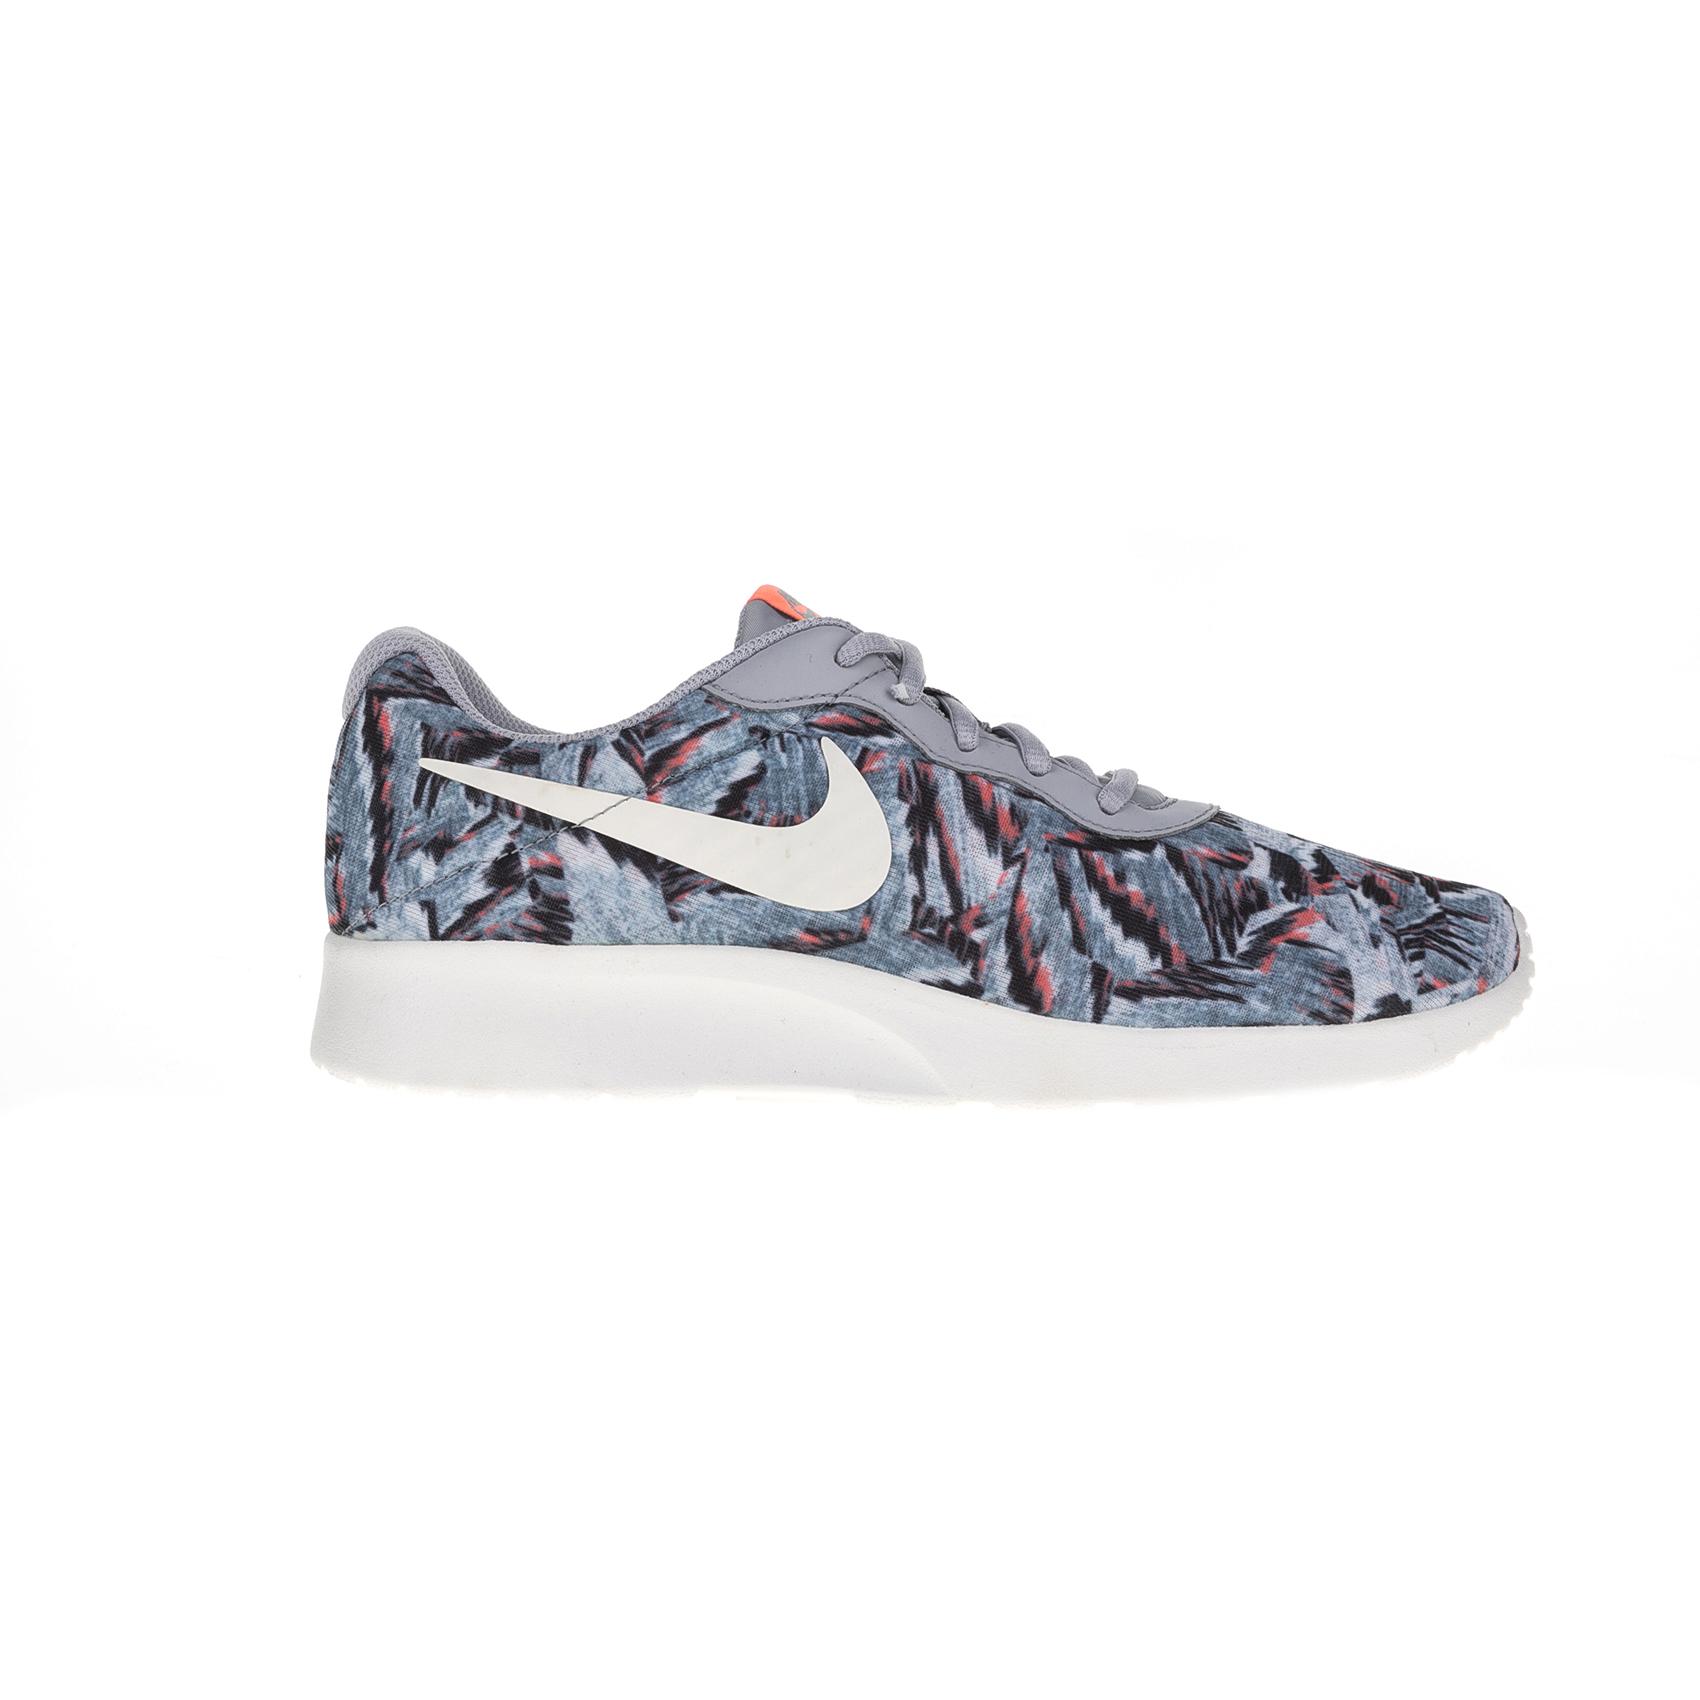 NIKE – Γυναικεία αθλητικά παπούτσια Nike TANJUN PRINT γκρι-μπλε